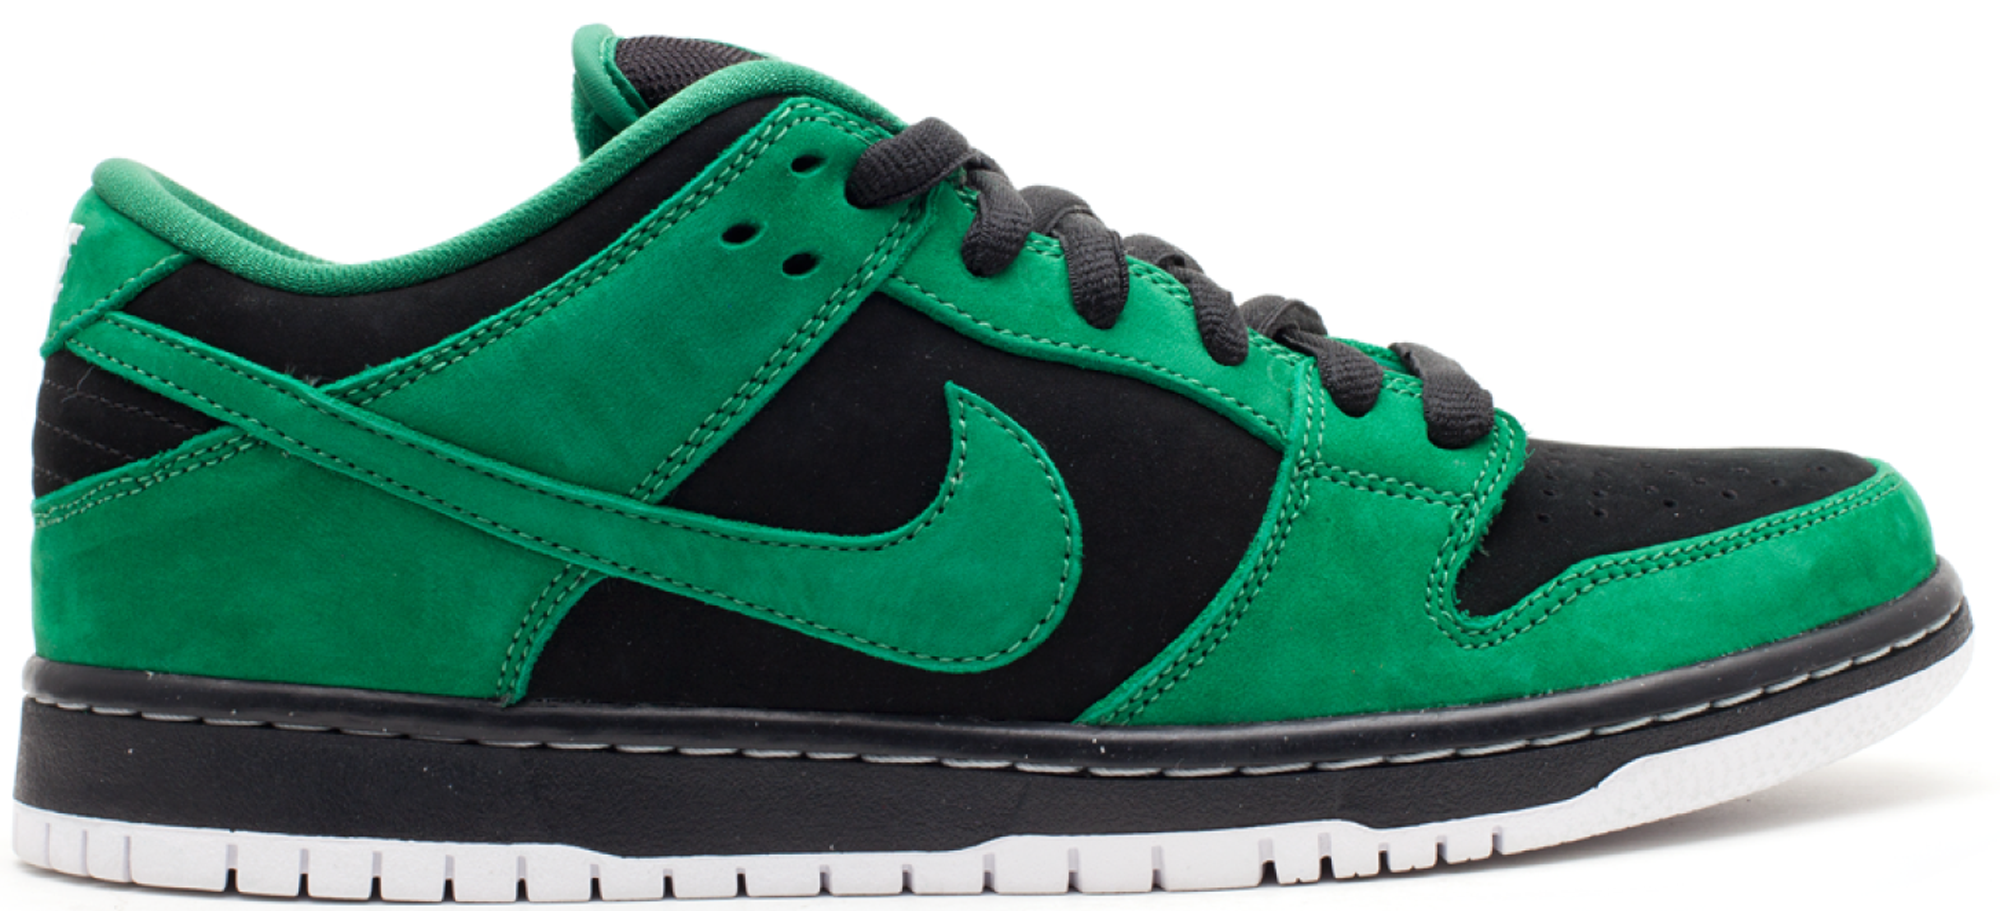 Nike SB Dunk Low Black Pine Green